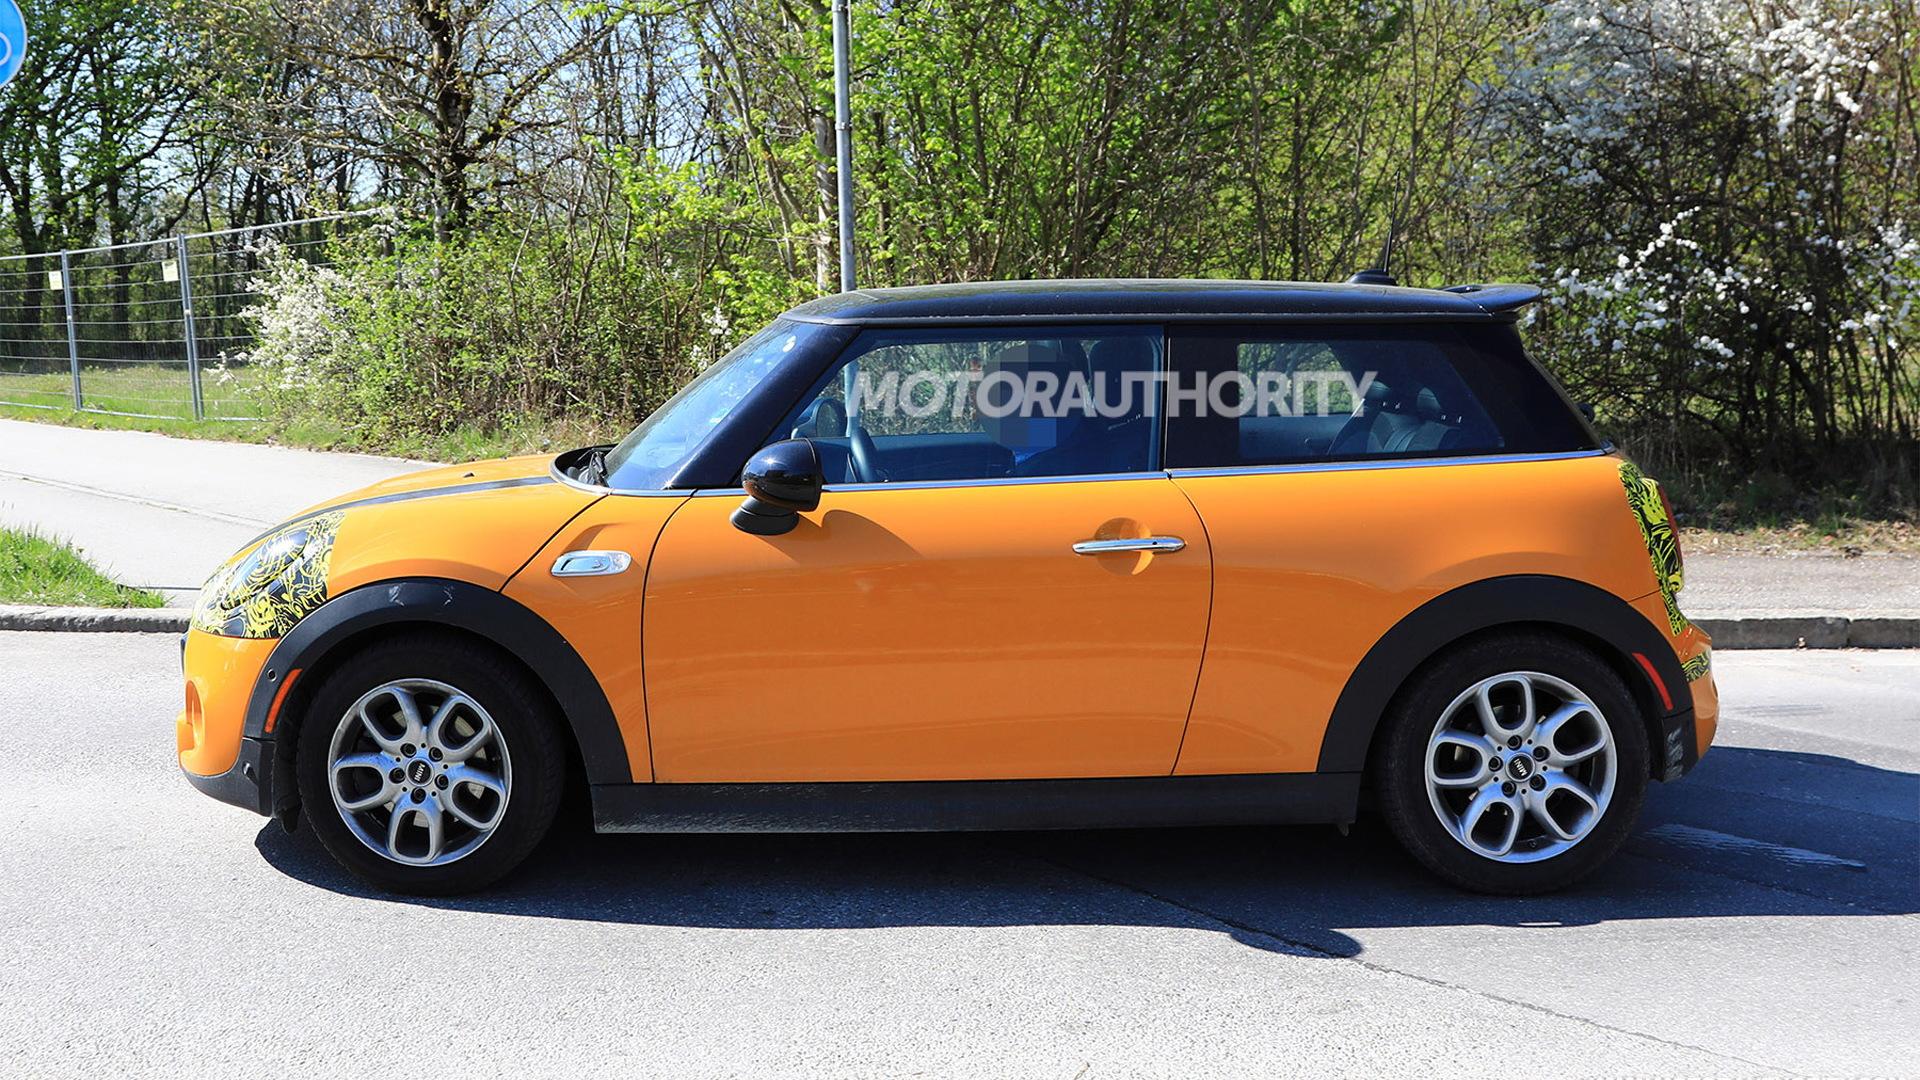 2019 Mini Hardtop facelift spy shots - Image via S. Baldauf/SB-Medien